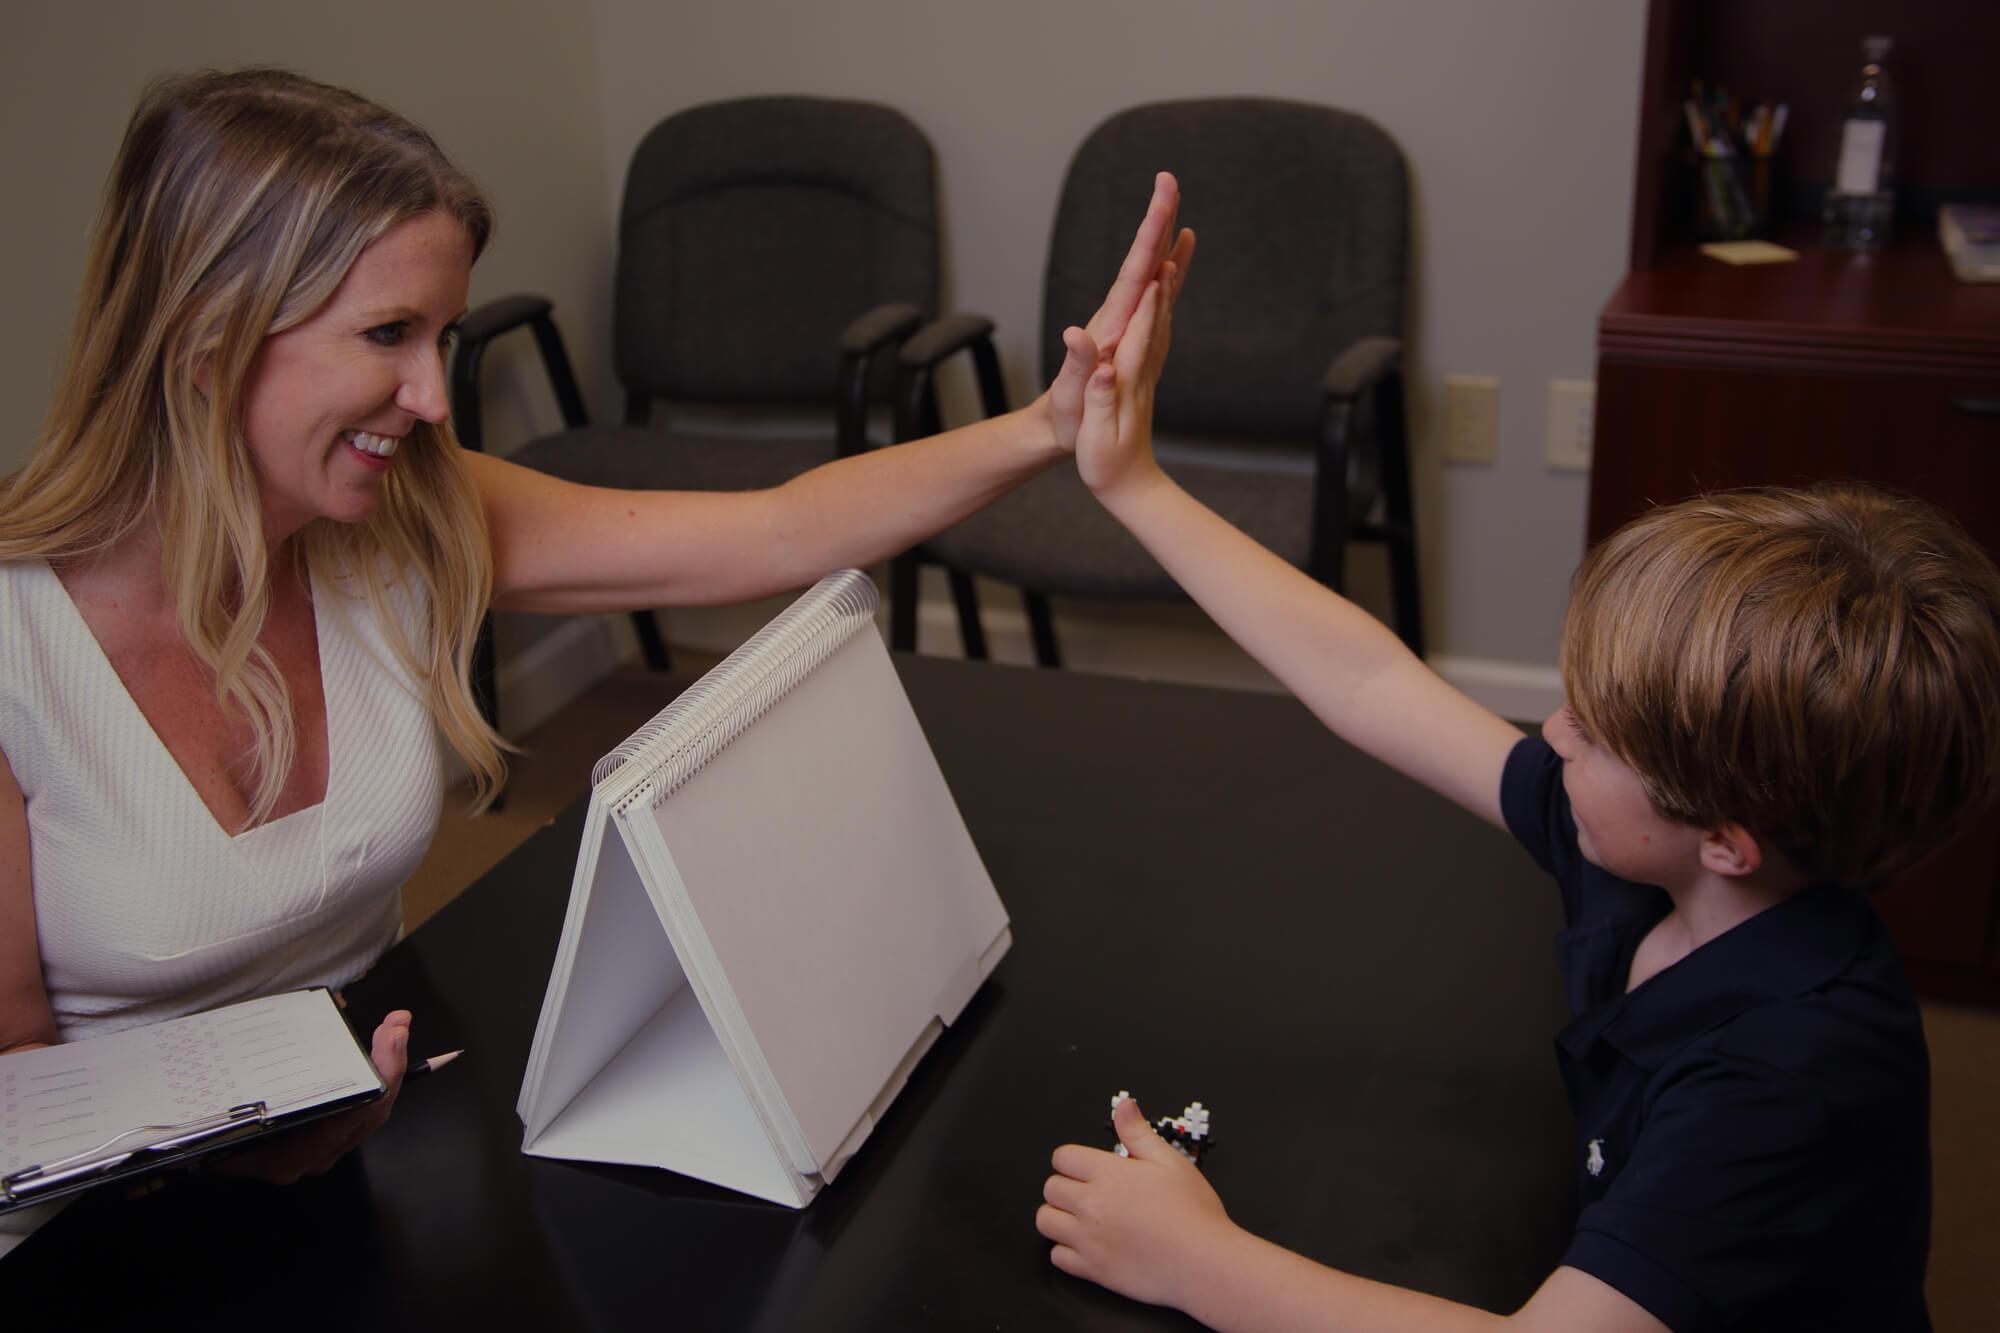 Dr. Kelderman exchanges a high-five with a patient.